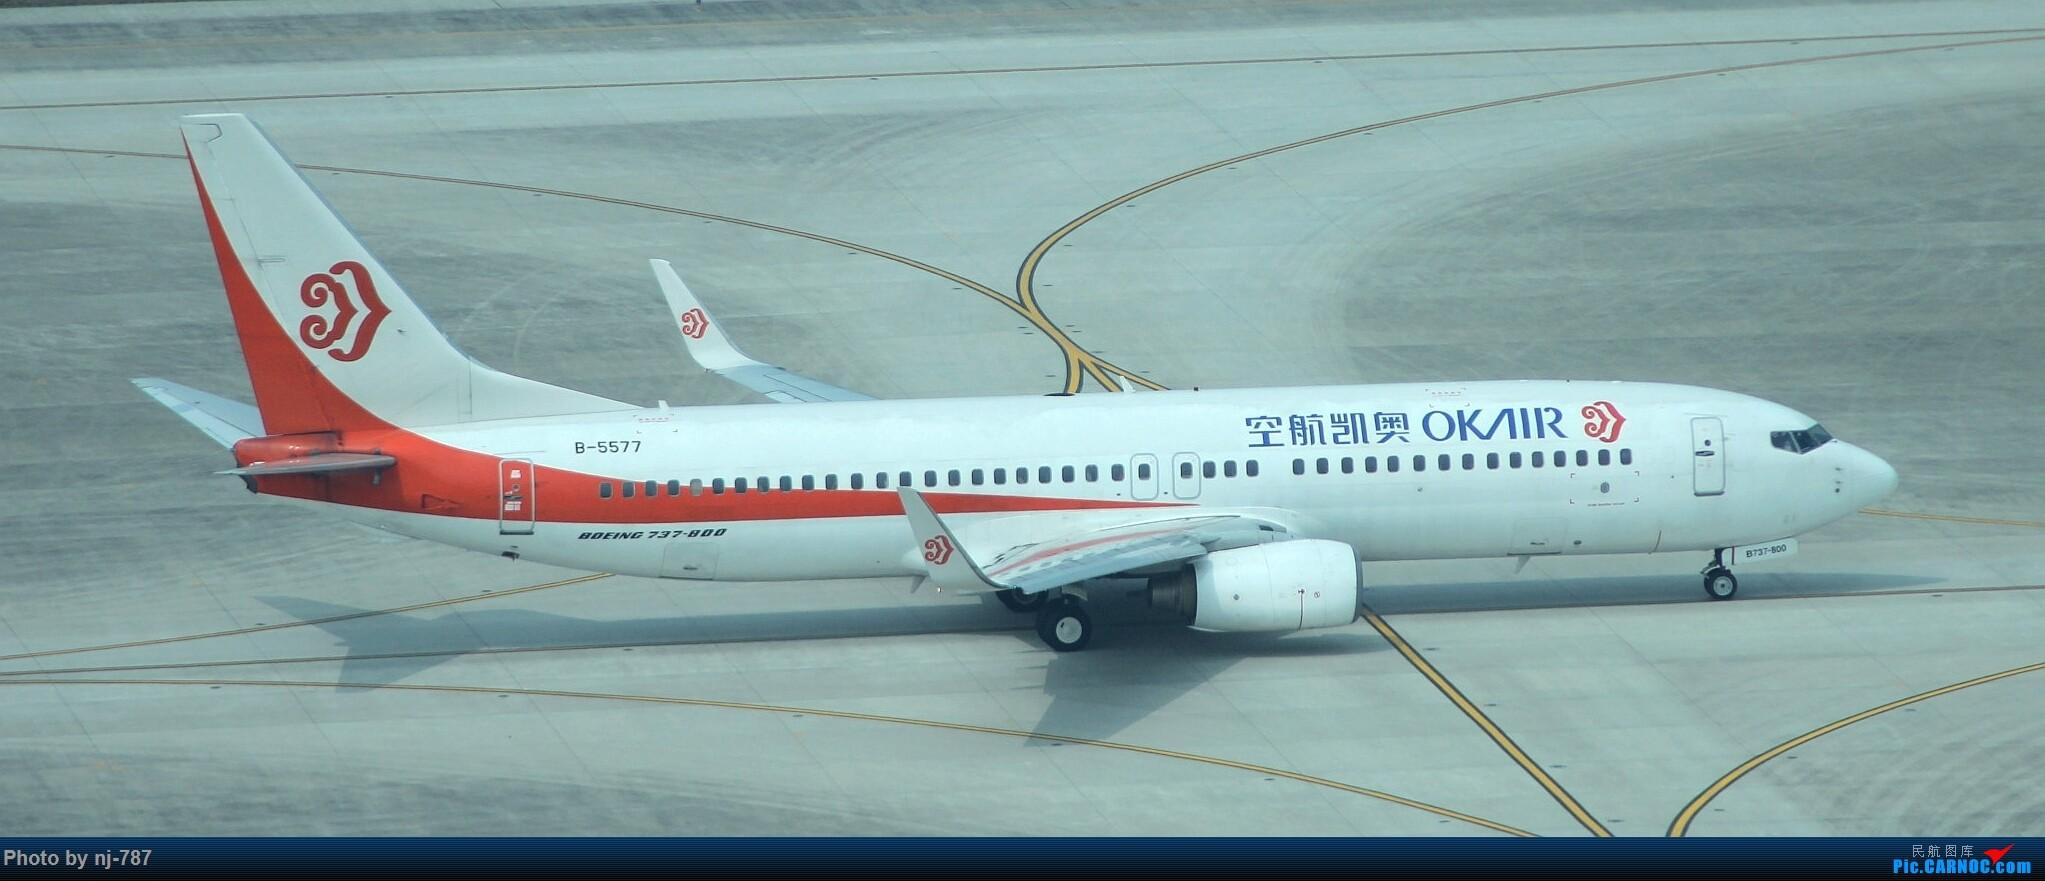 Re:[原创]站得高,看得远!NKG双跑,T2启用后初踏! BOEING 737-800 B-5577 南京禄口国际机场